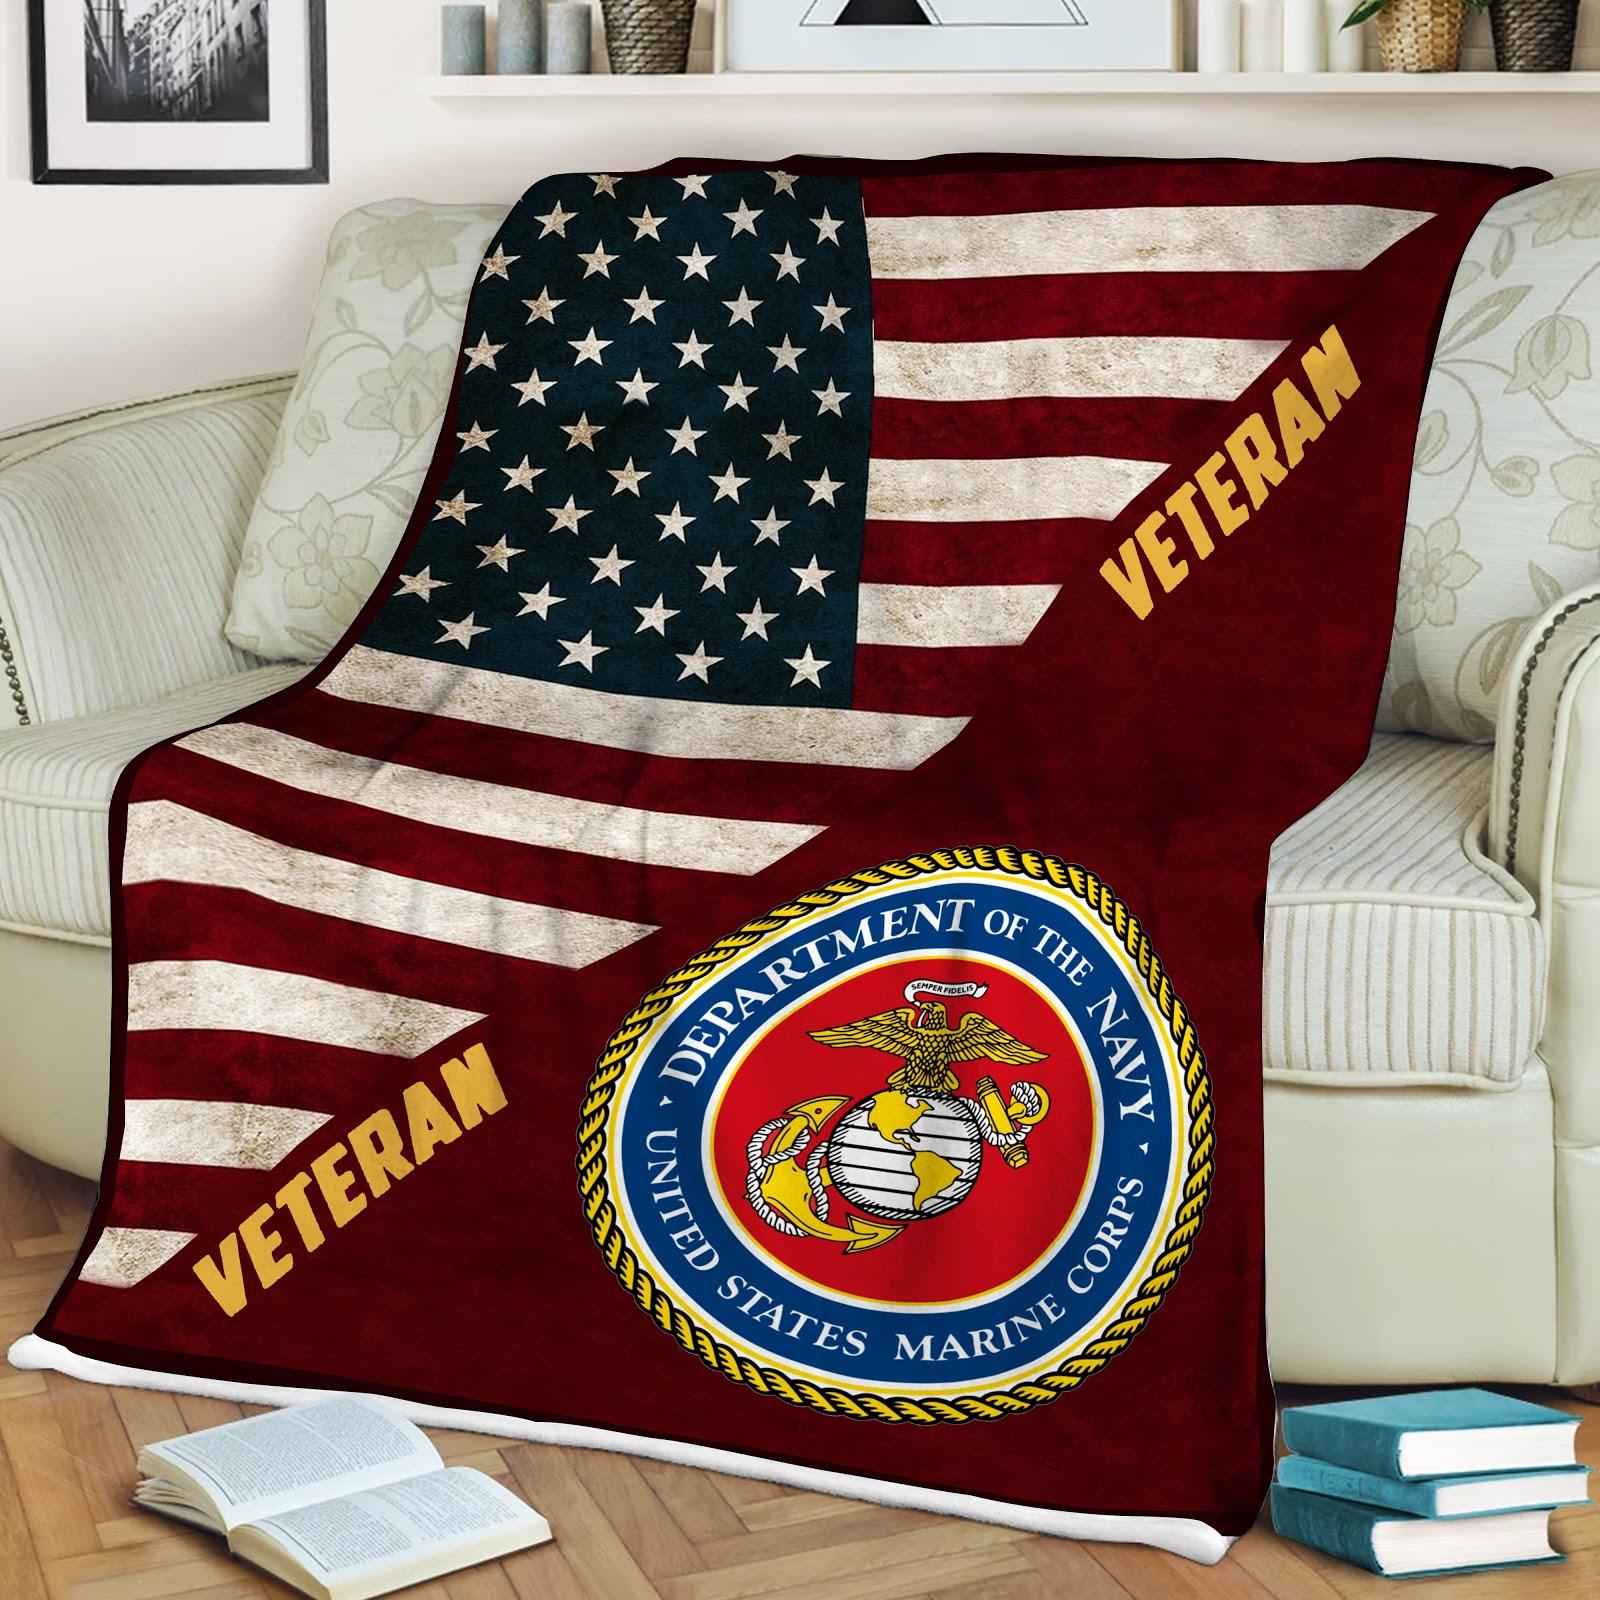 Veteran of marine full printing blanket 2